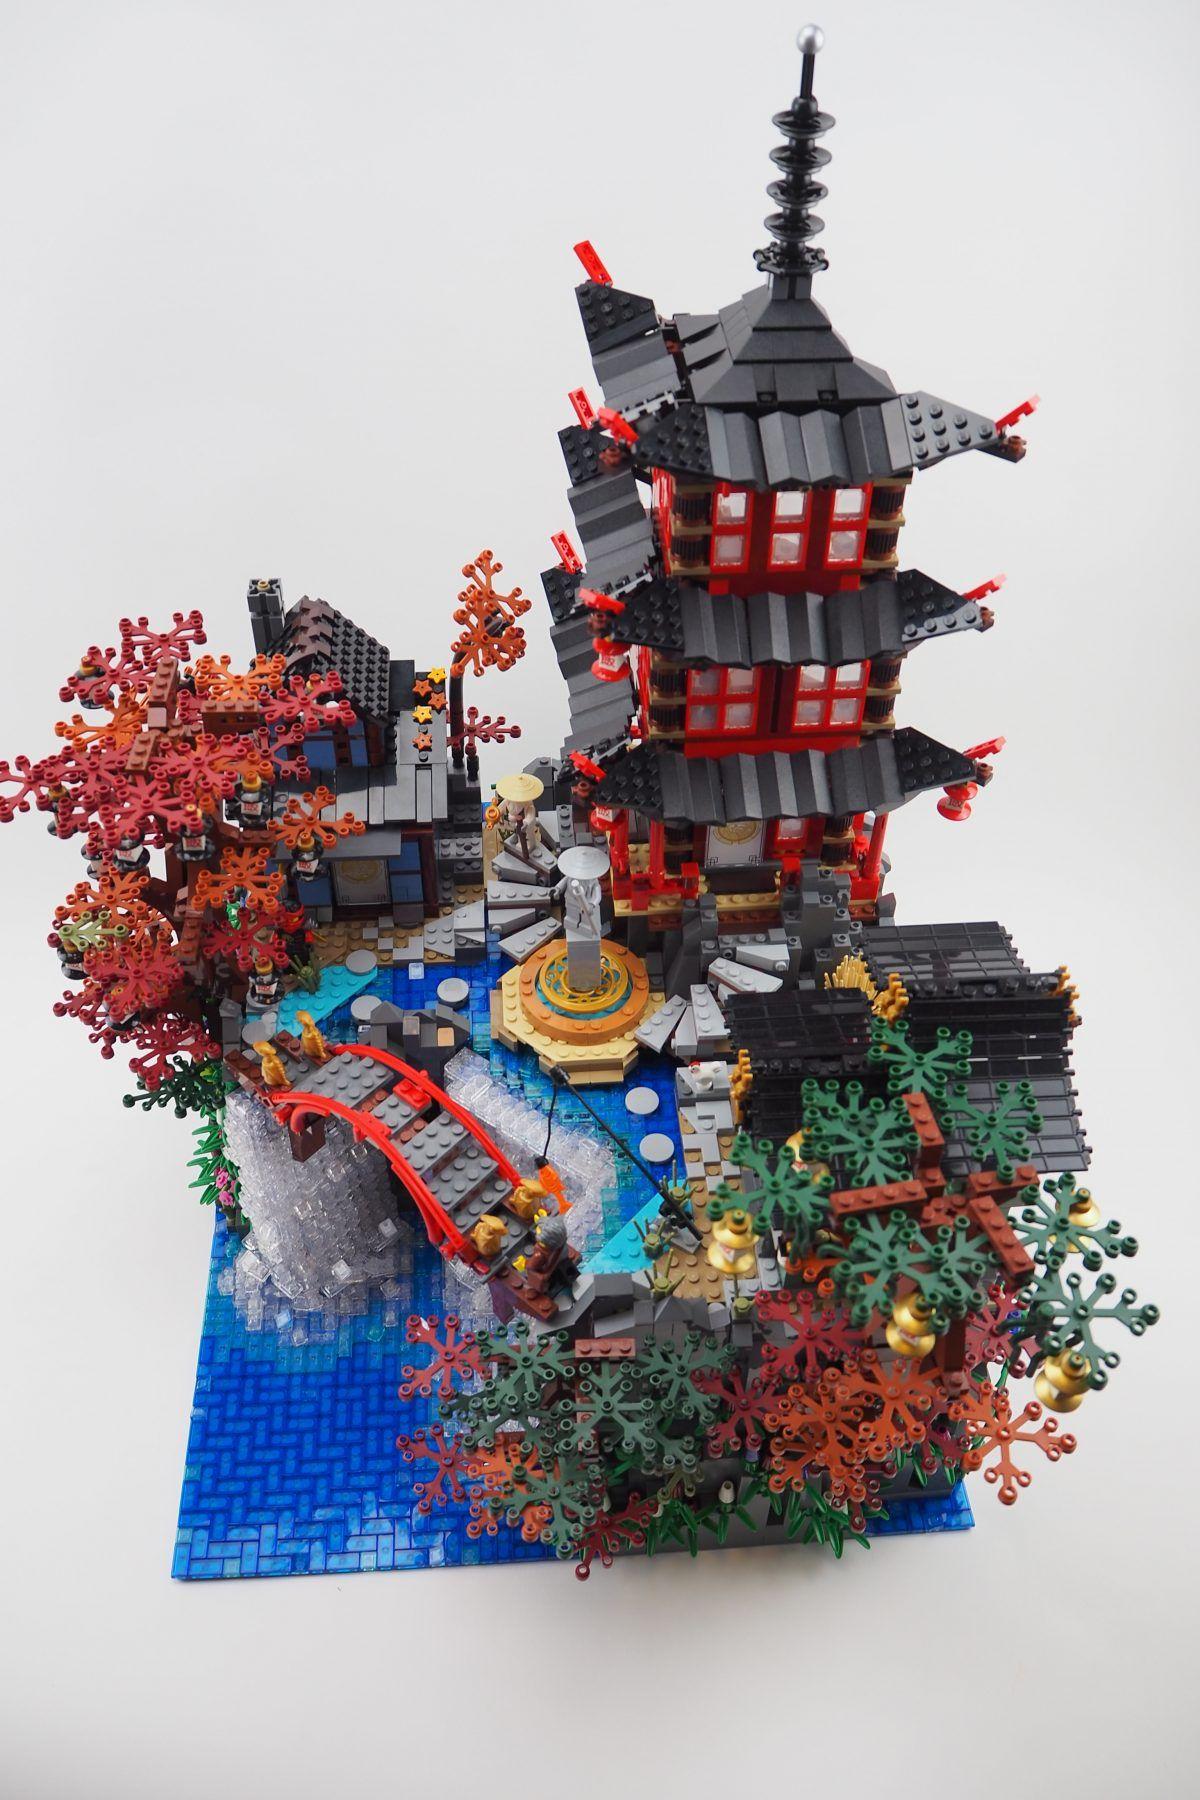 lego ninjago waterfall temple | lego | pinterest | lego ideen, lego